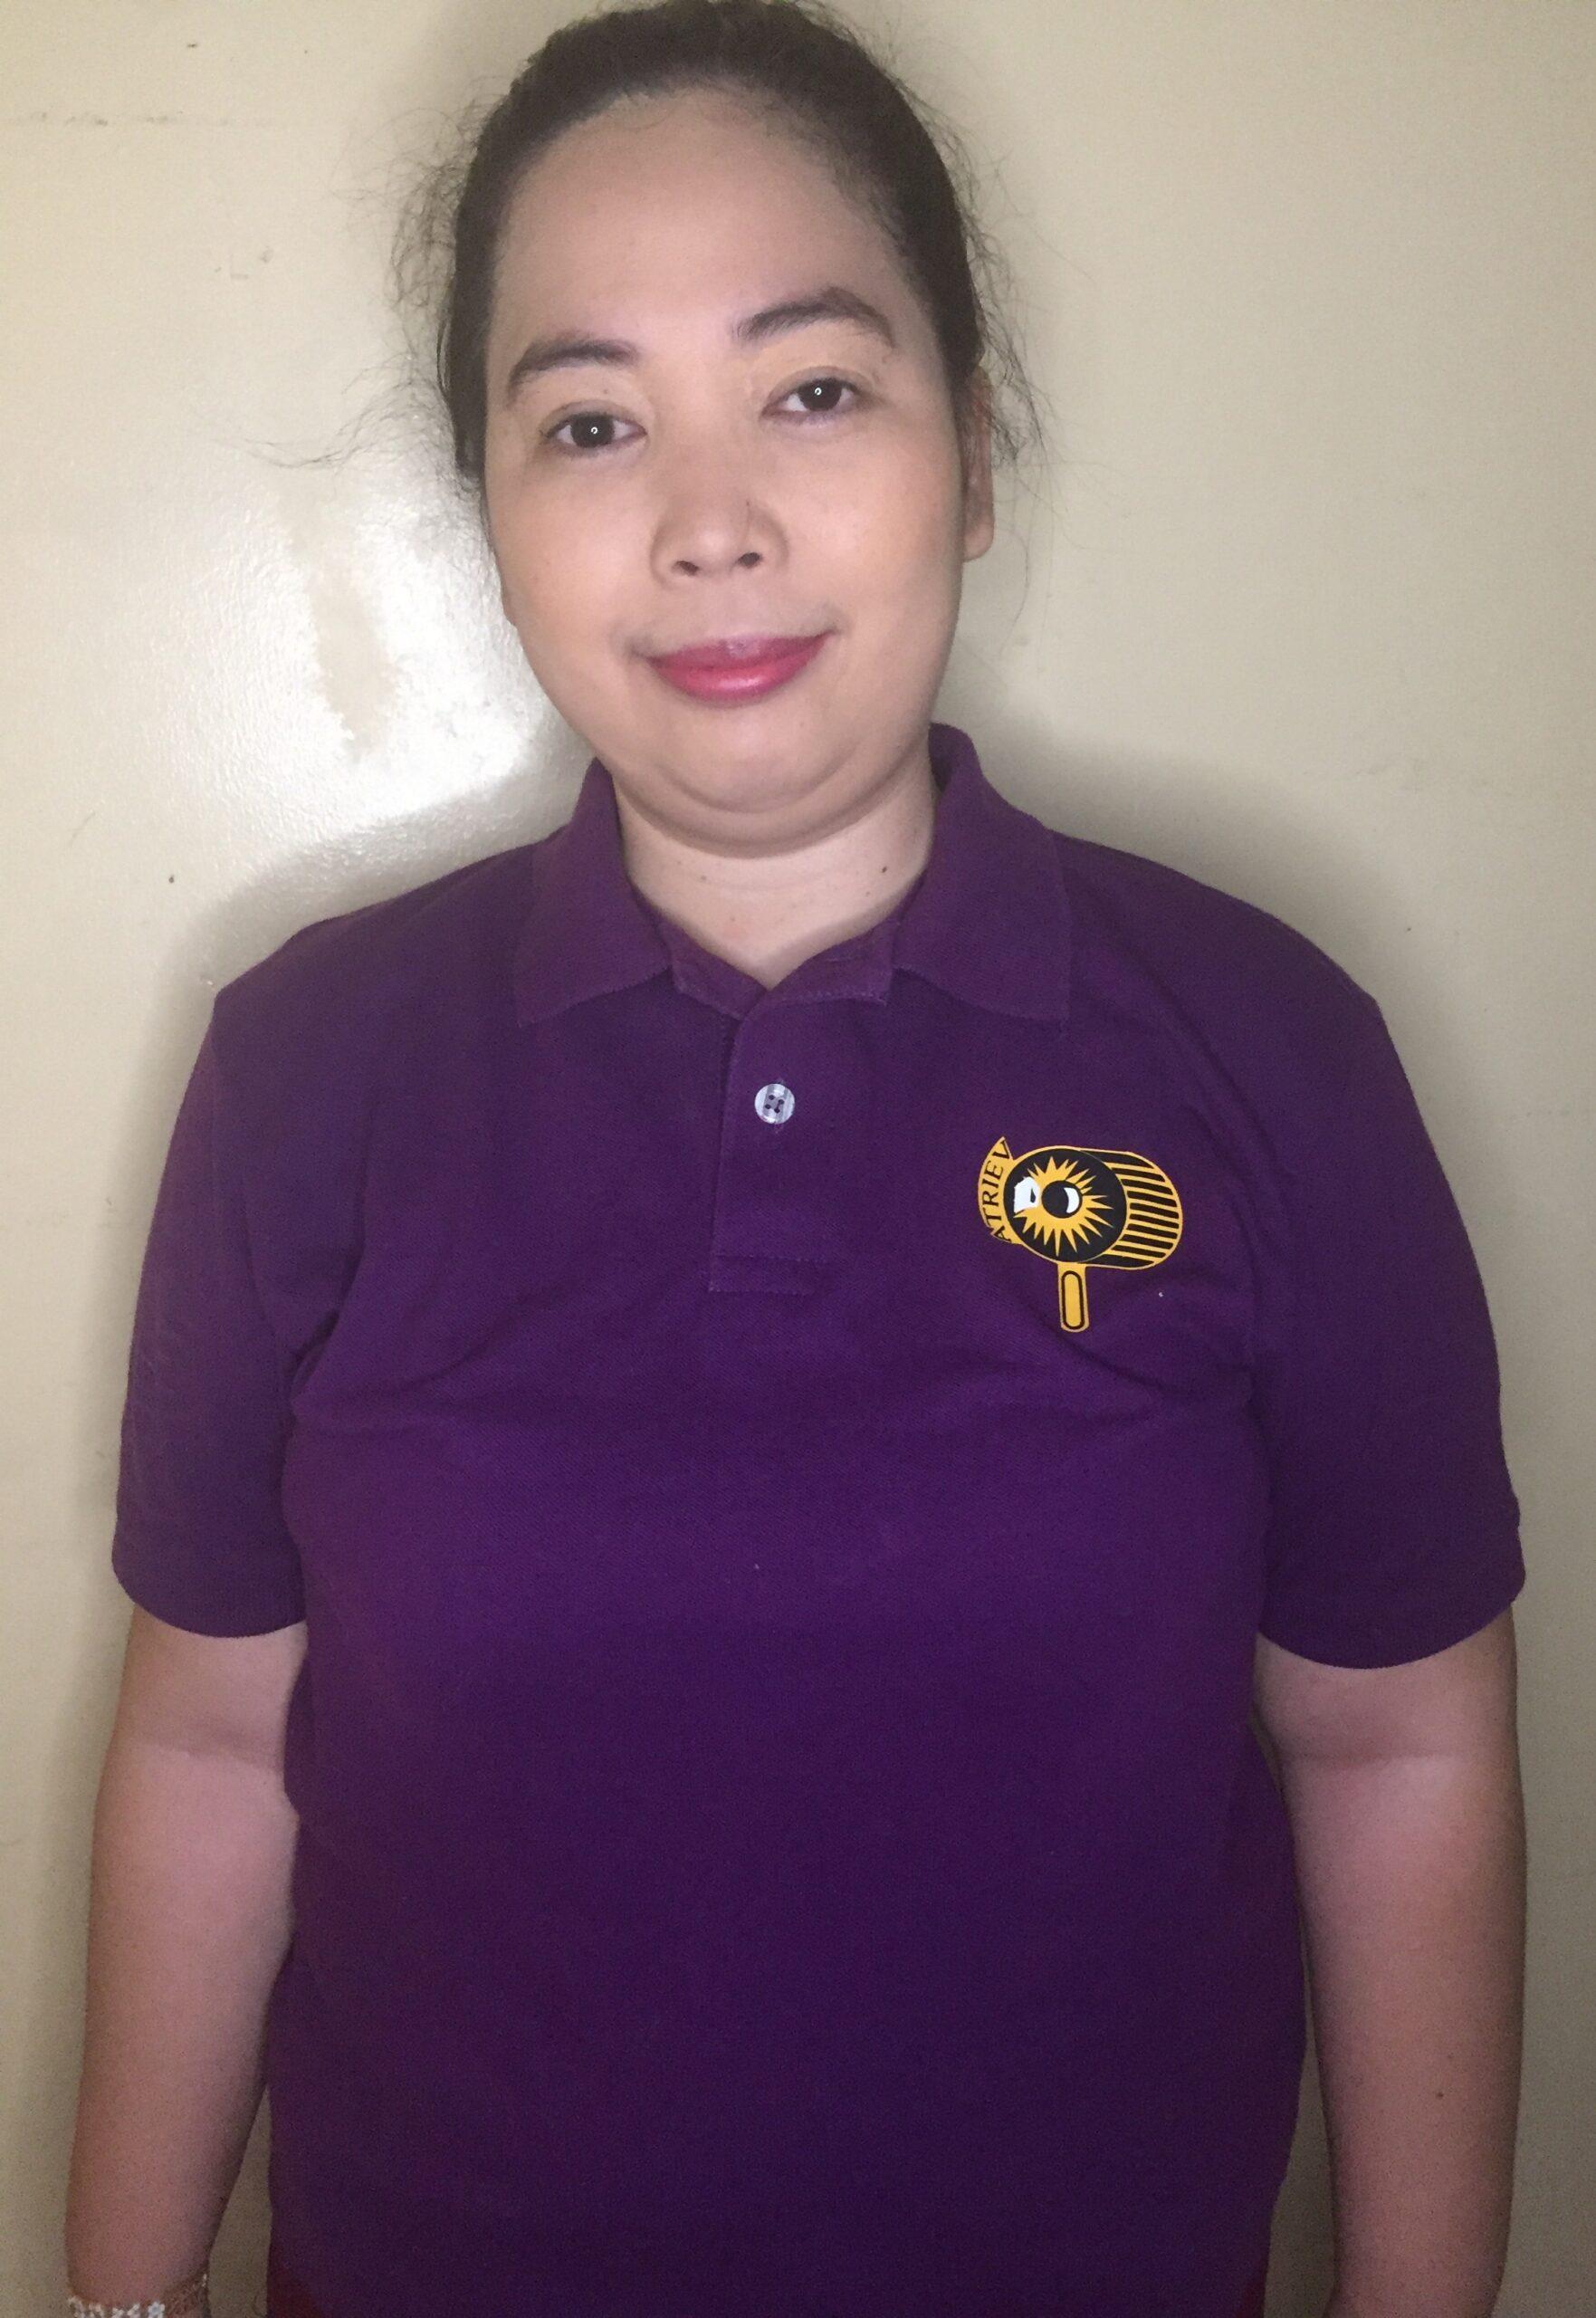 Ma'am Karla wearing the ATRIEV polo shirt